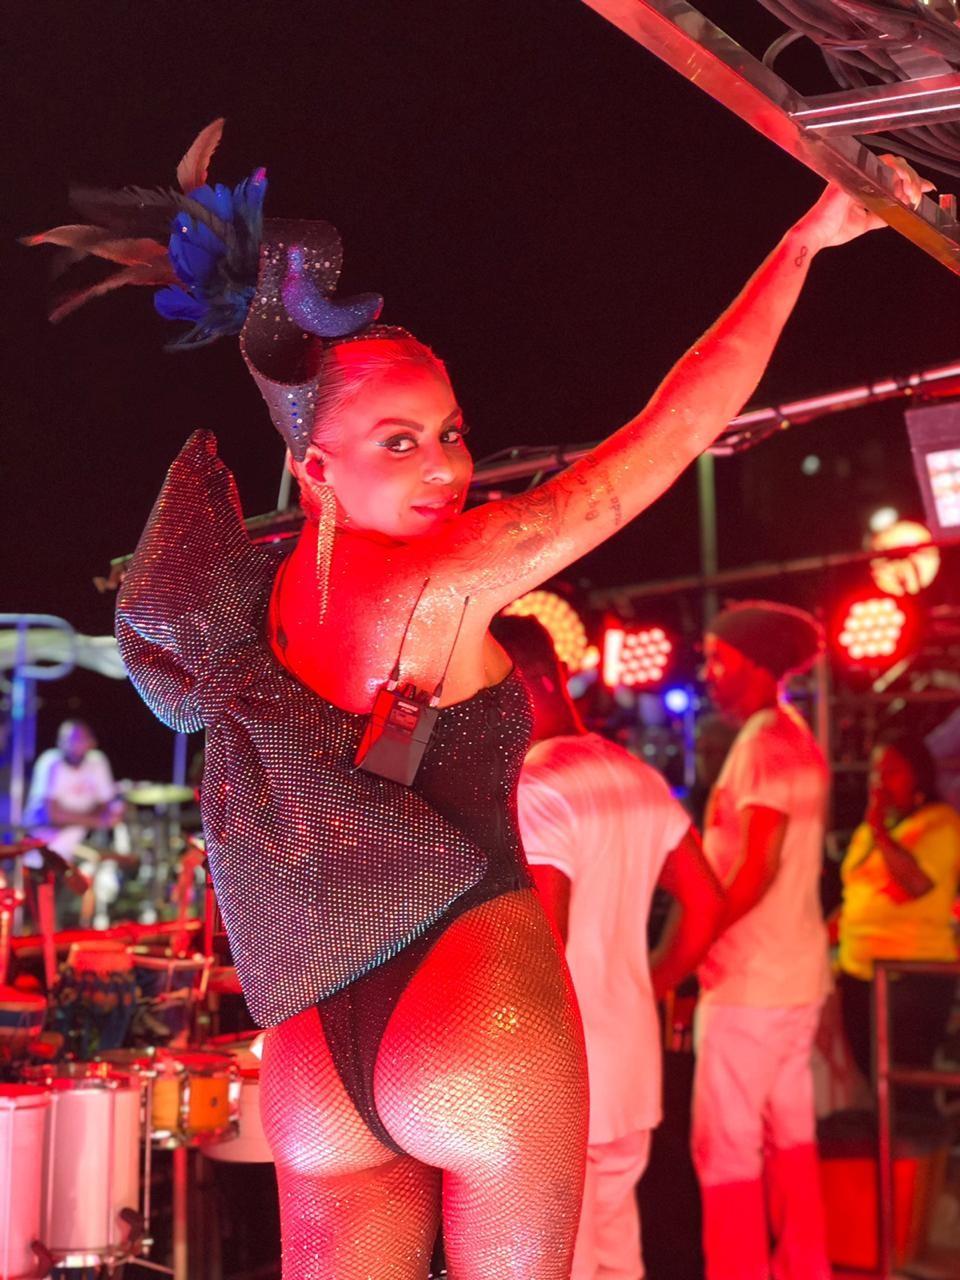 Com look sexy preto, Alinne Rosa puxa trio no carnaval de Salvador